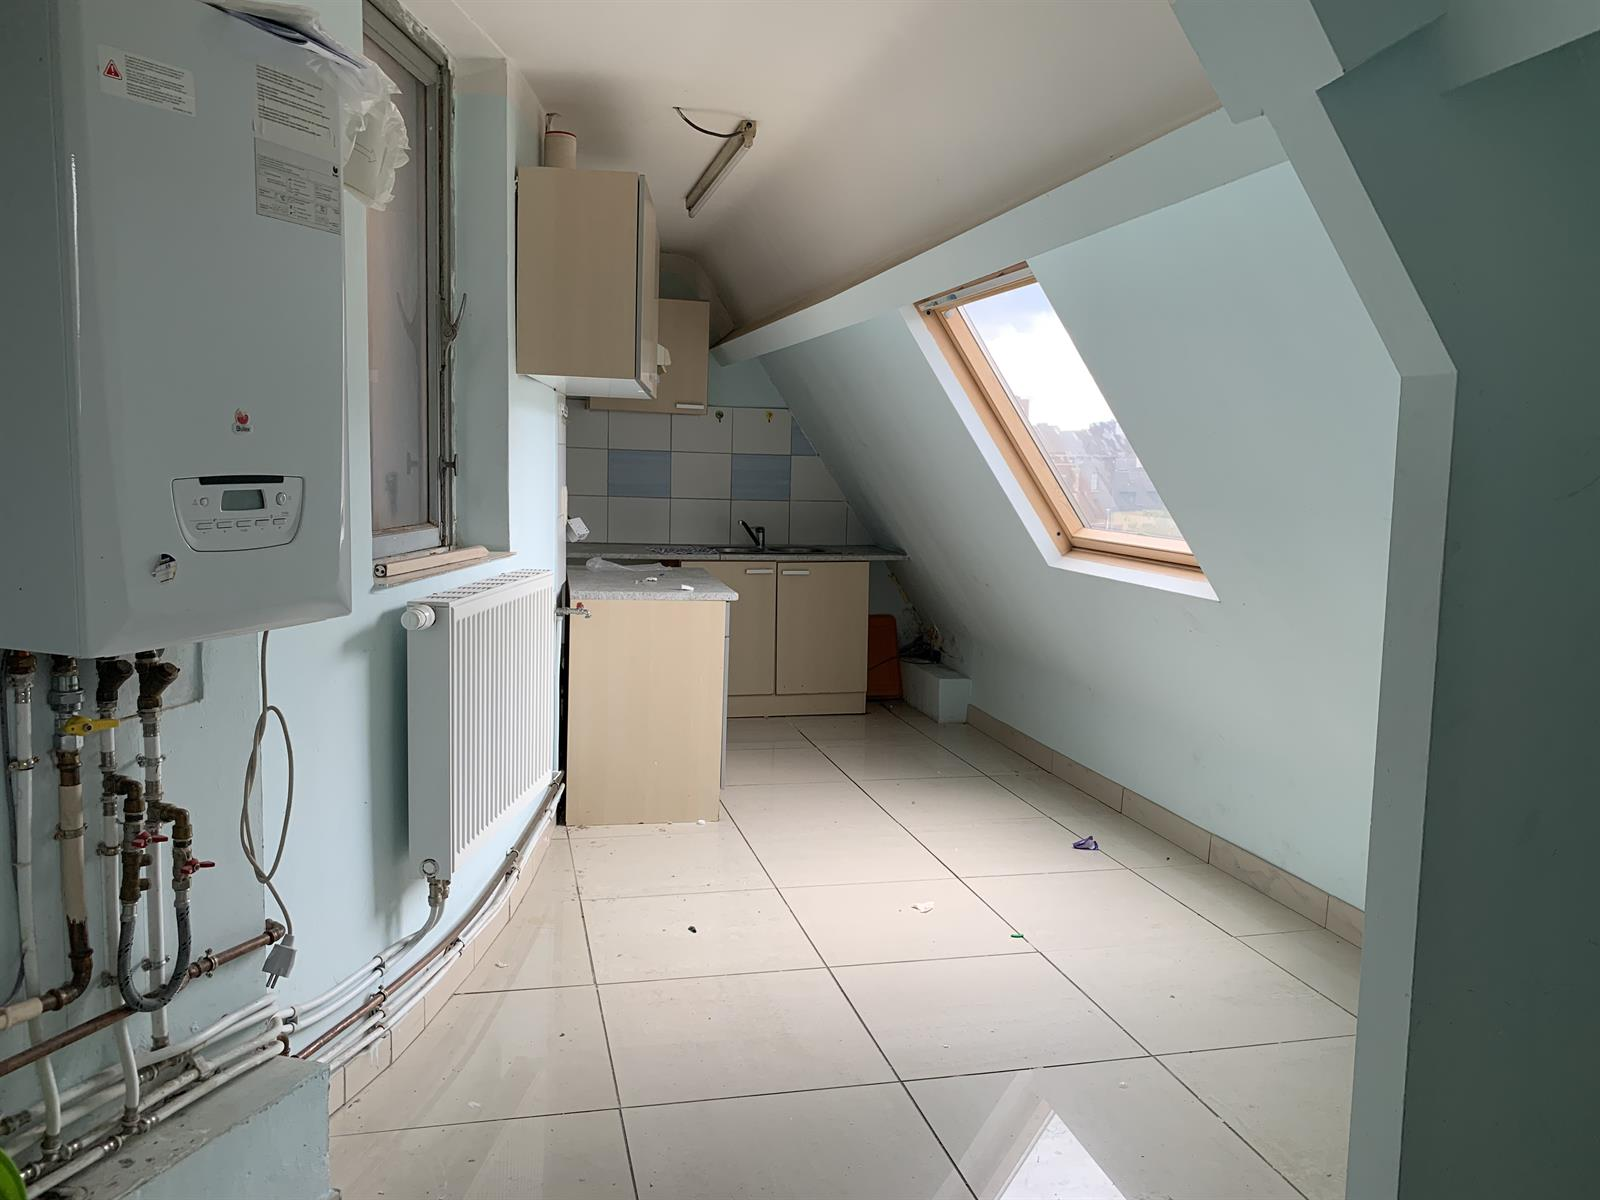 Immeuble à usage multiple - Charleroi - #4292206-4